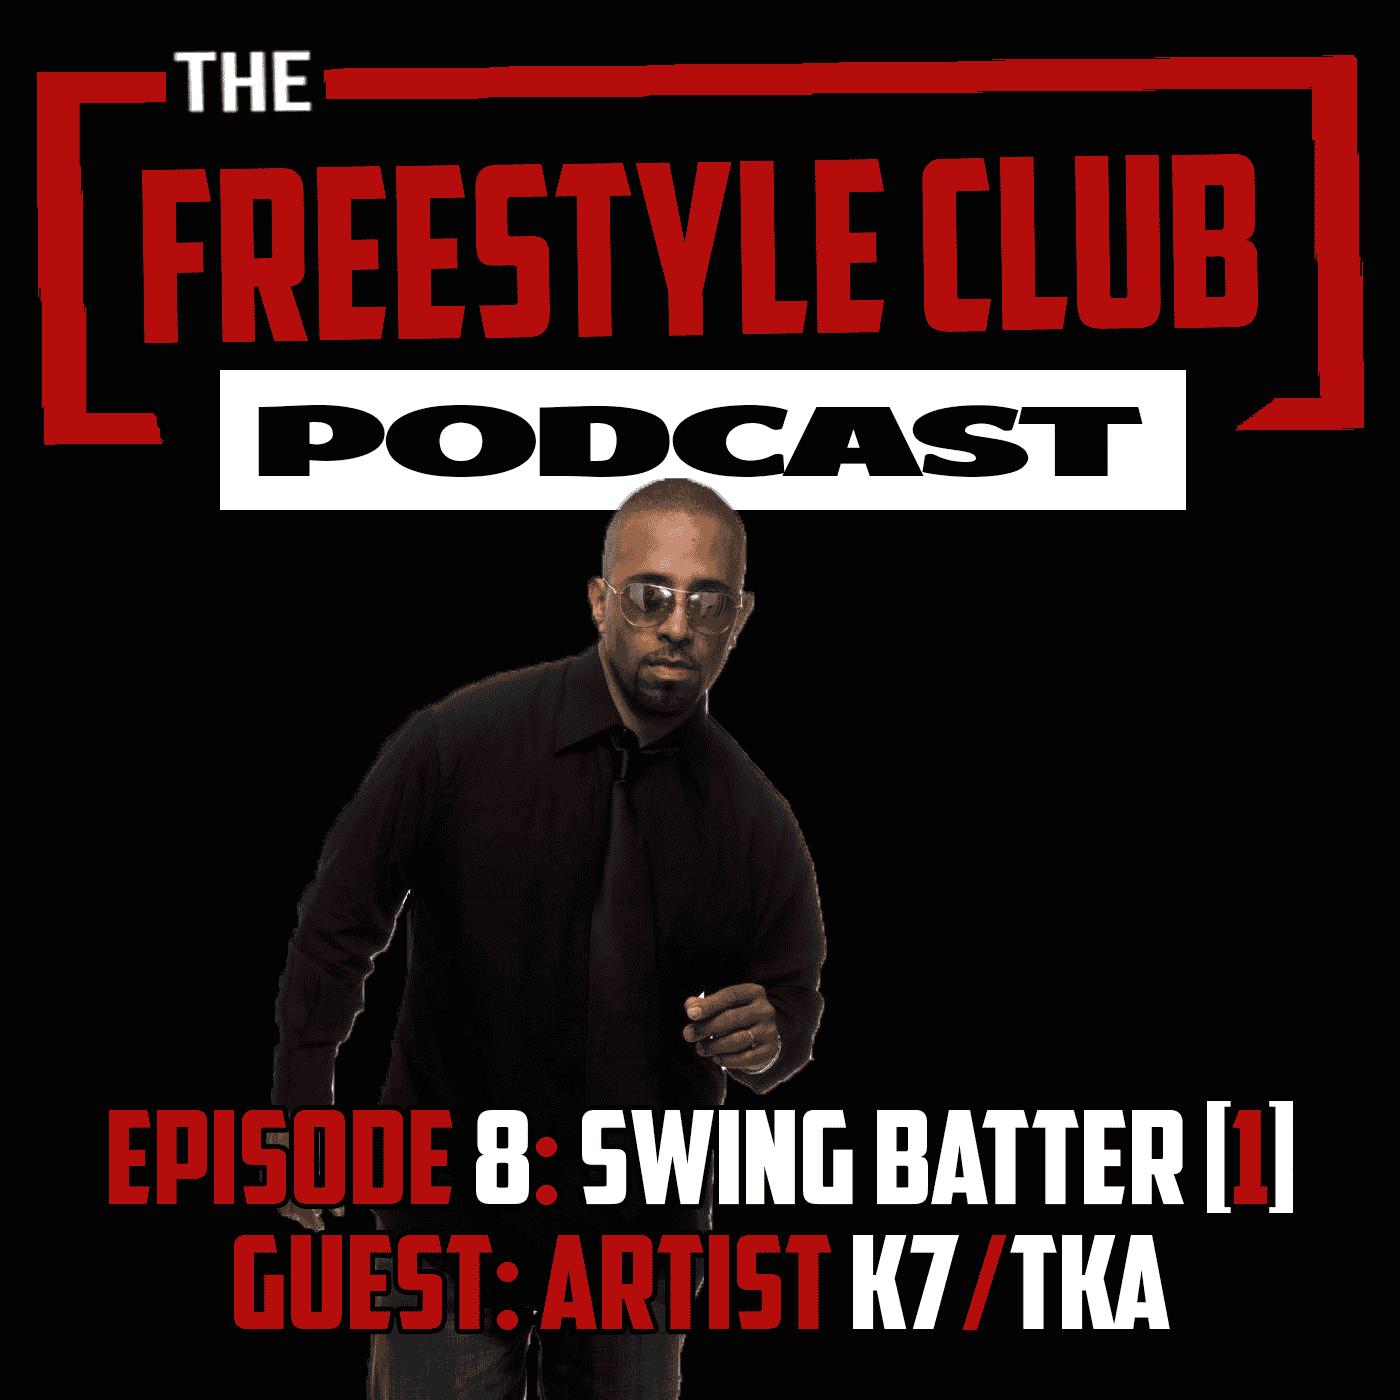 The Freestyle Club with K7/TKA